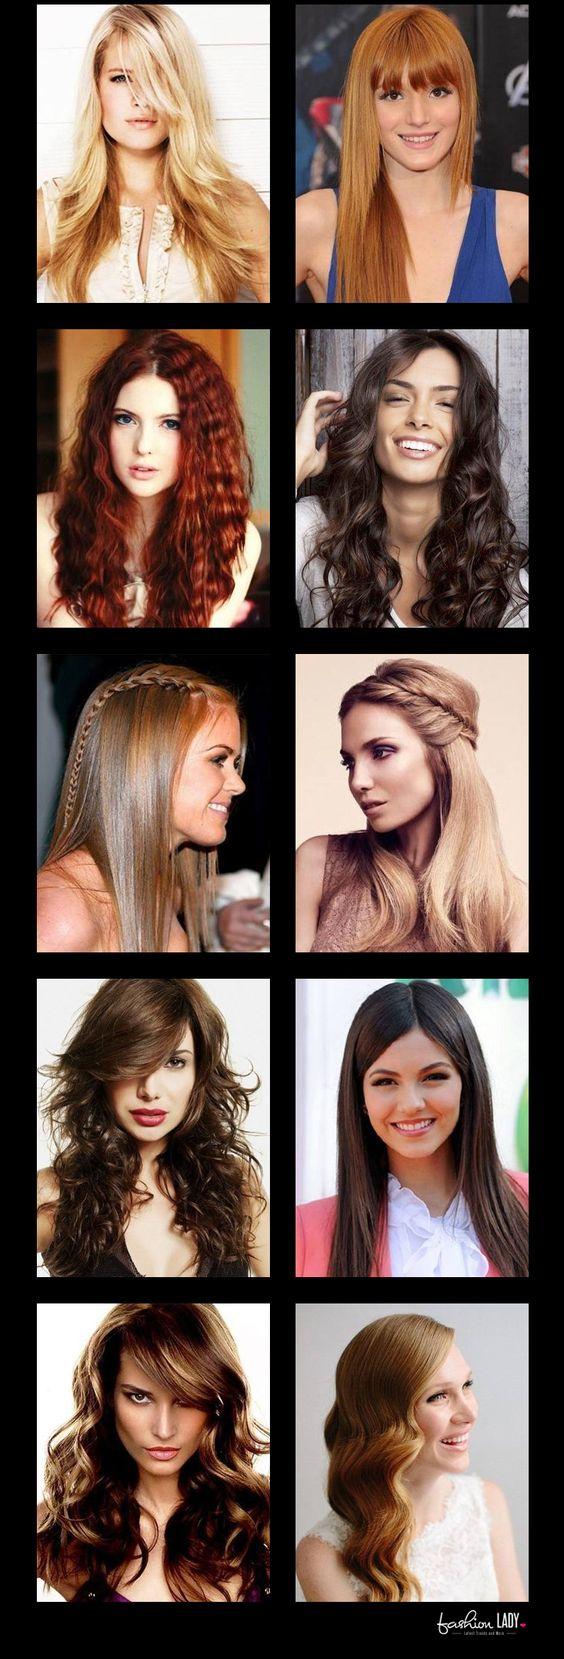 40 amazing feather cut hairstyling ideas - long, medium & short